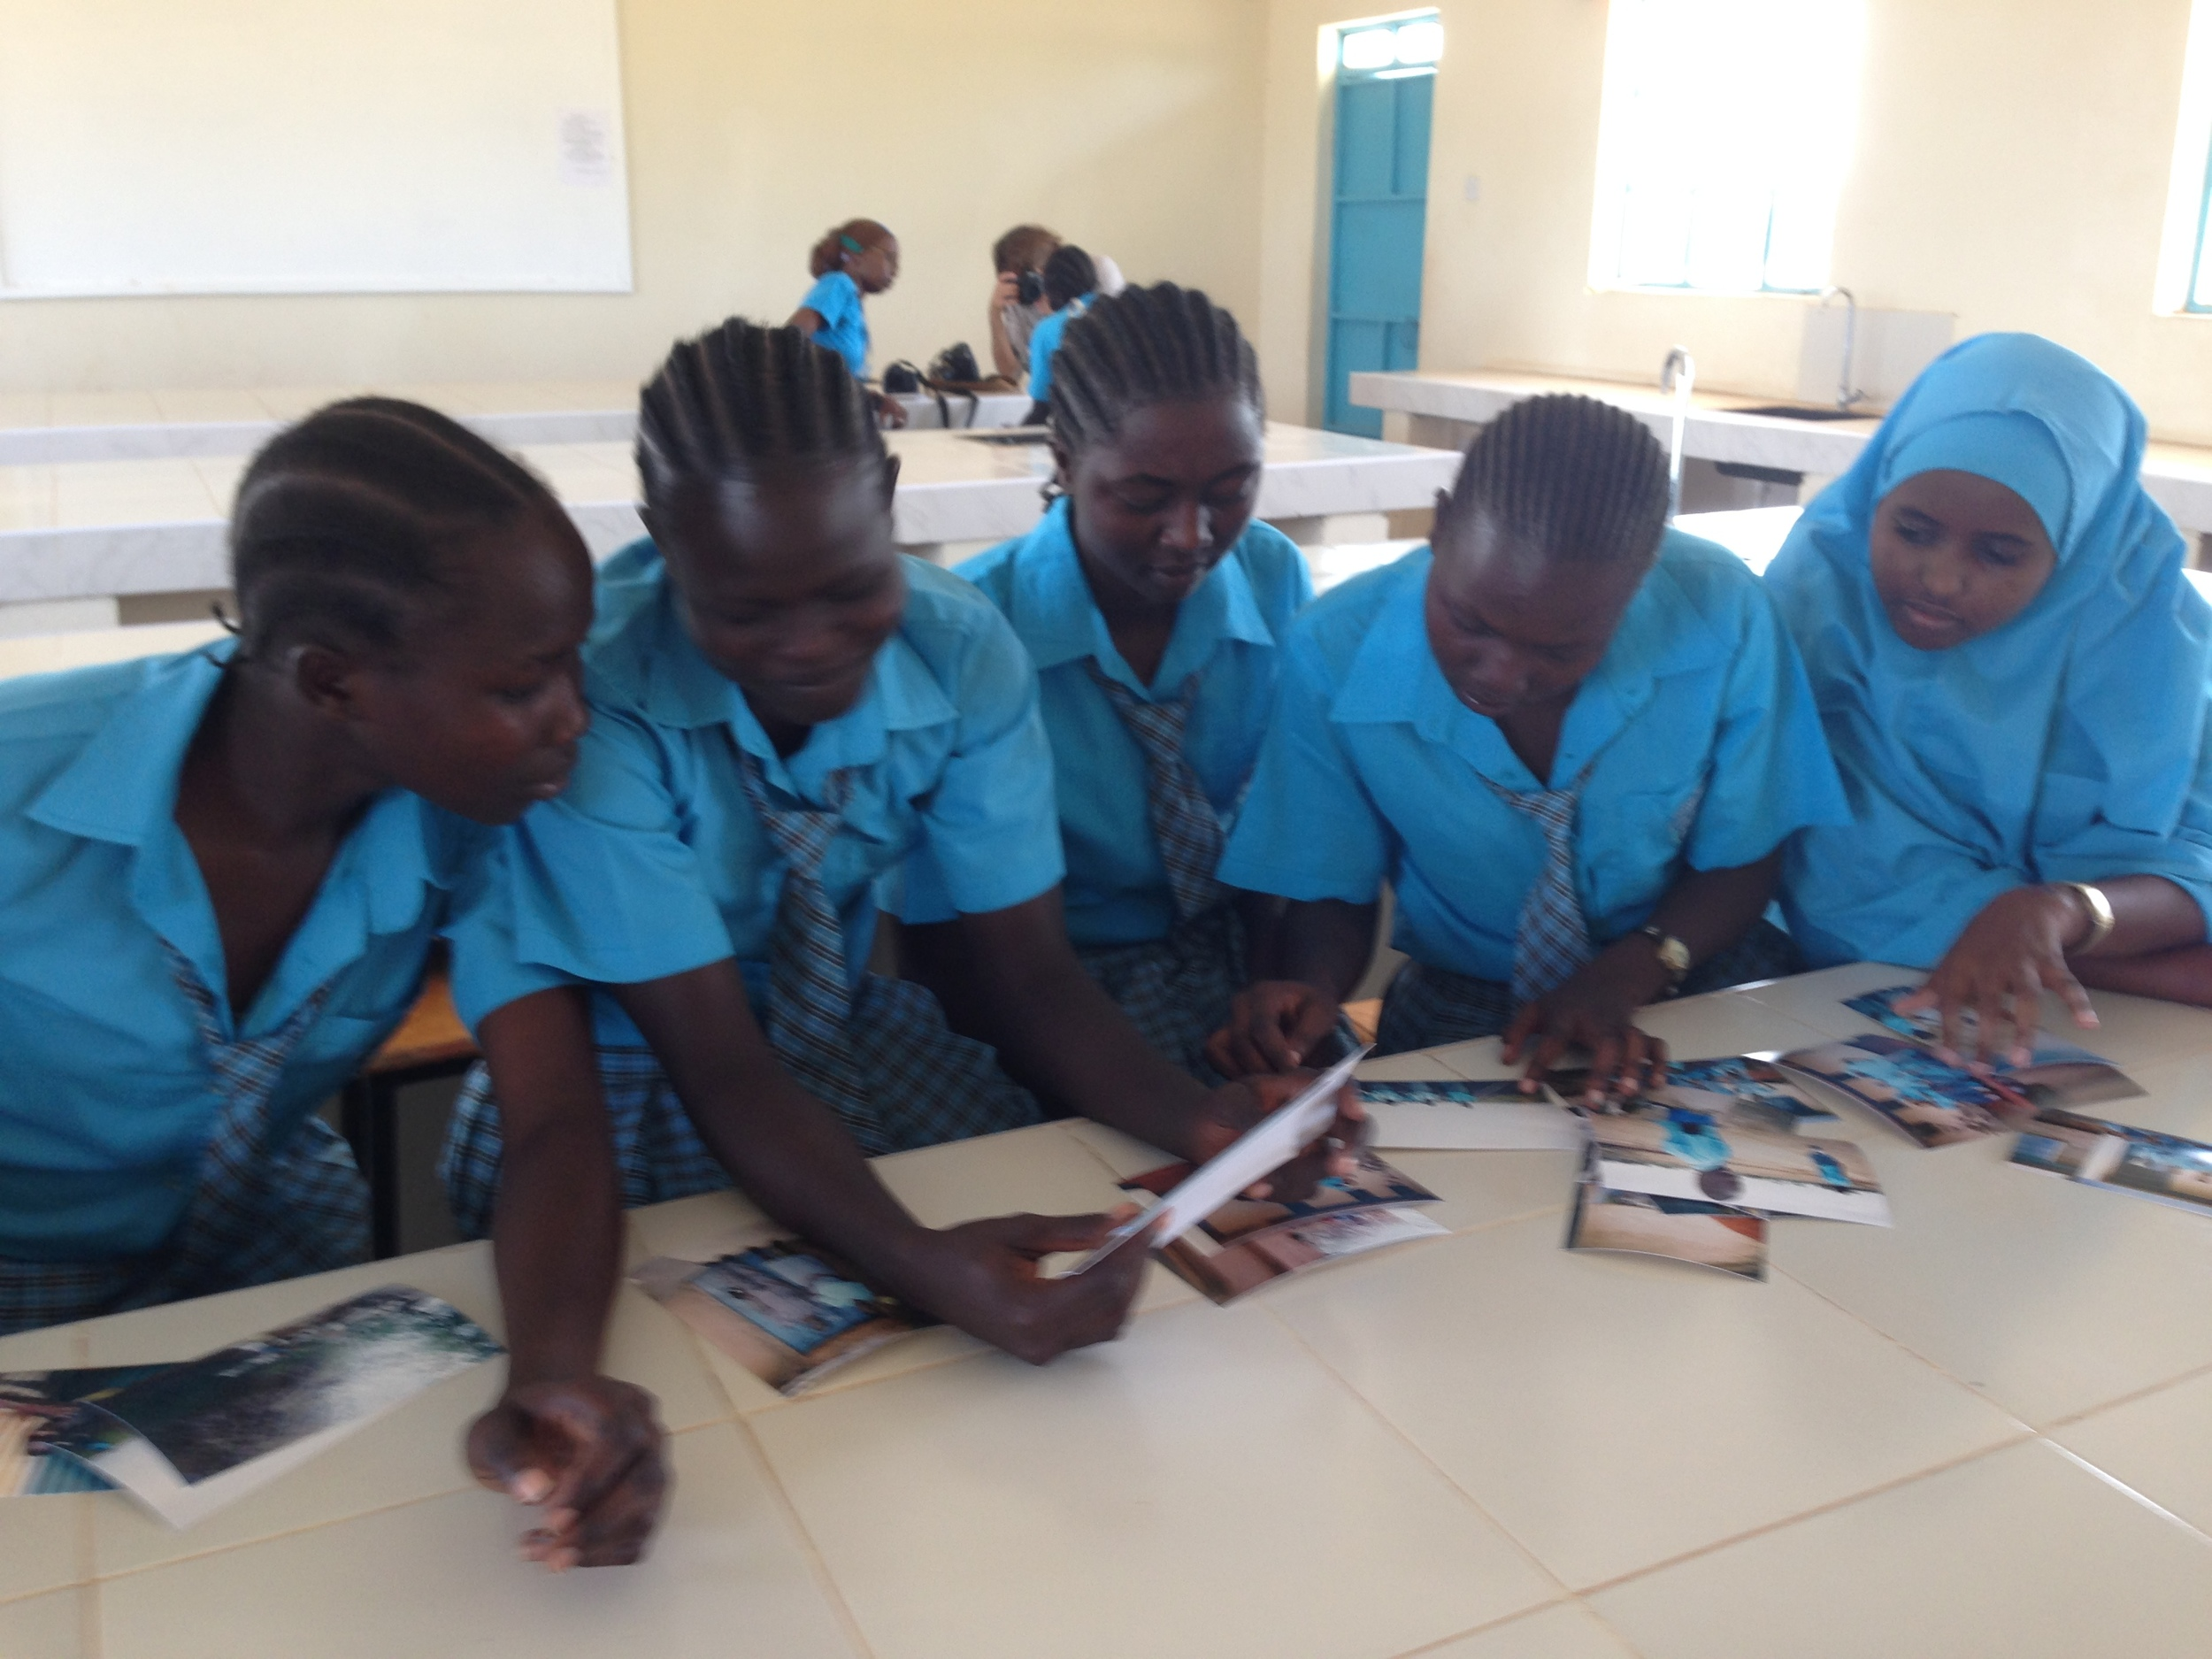 Rita, Nhial, Zahira, Nyimuch and Fardosa looking at the polaroid photos they took.